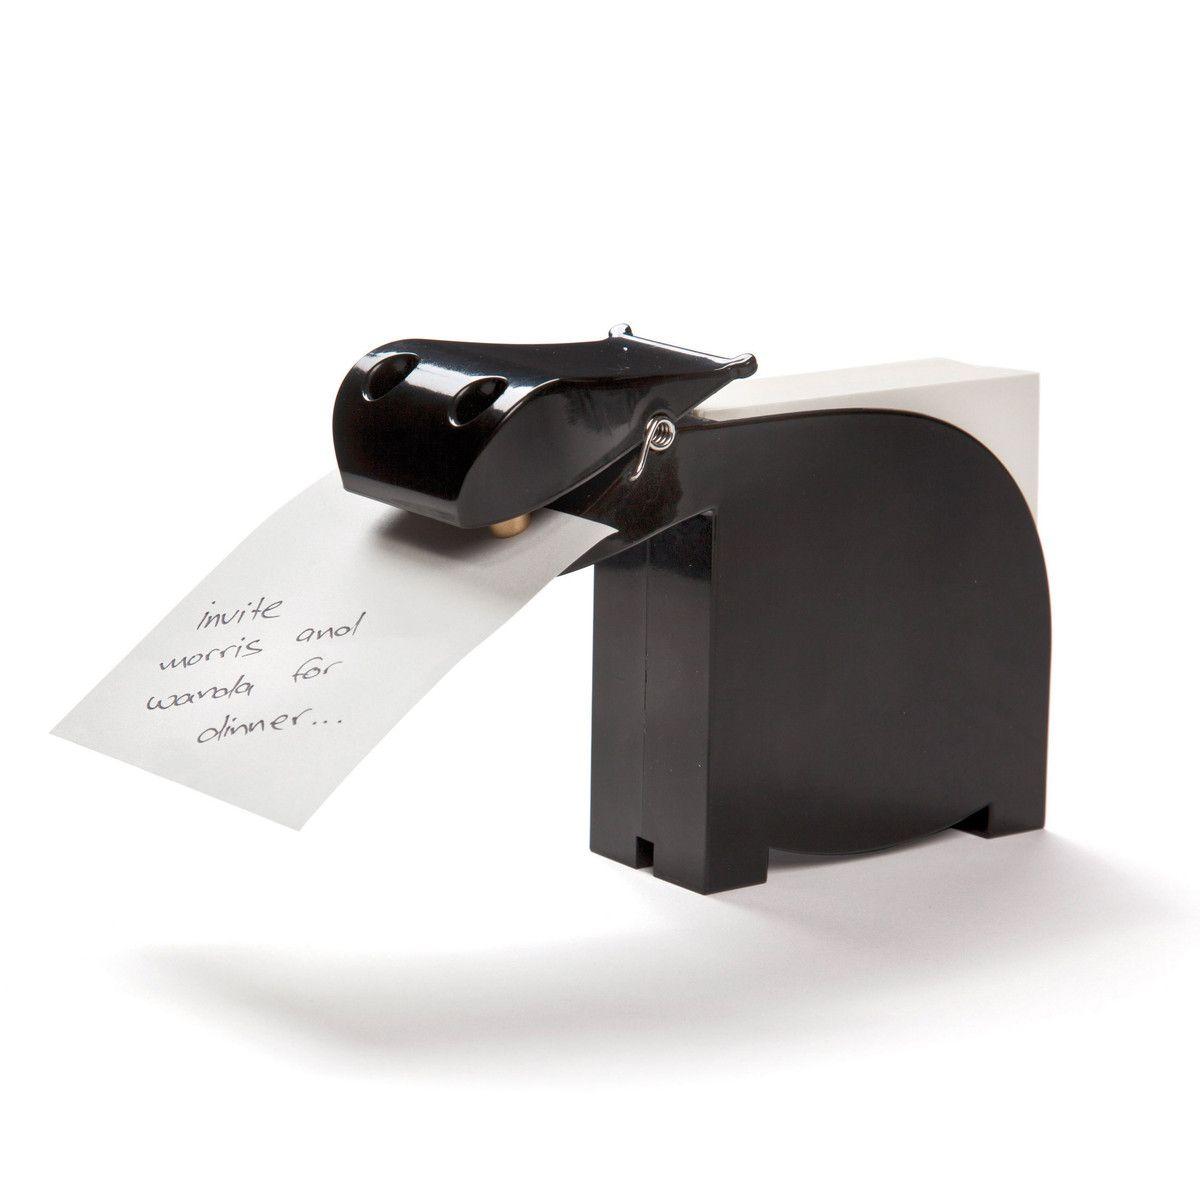 Bianca Memo Holder Black Office Gadget Memo Holder Desk Organization Funky Gifts